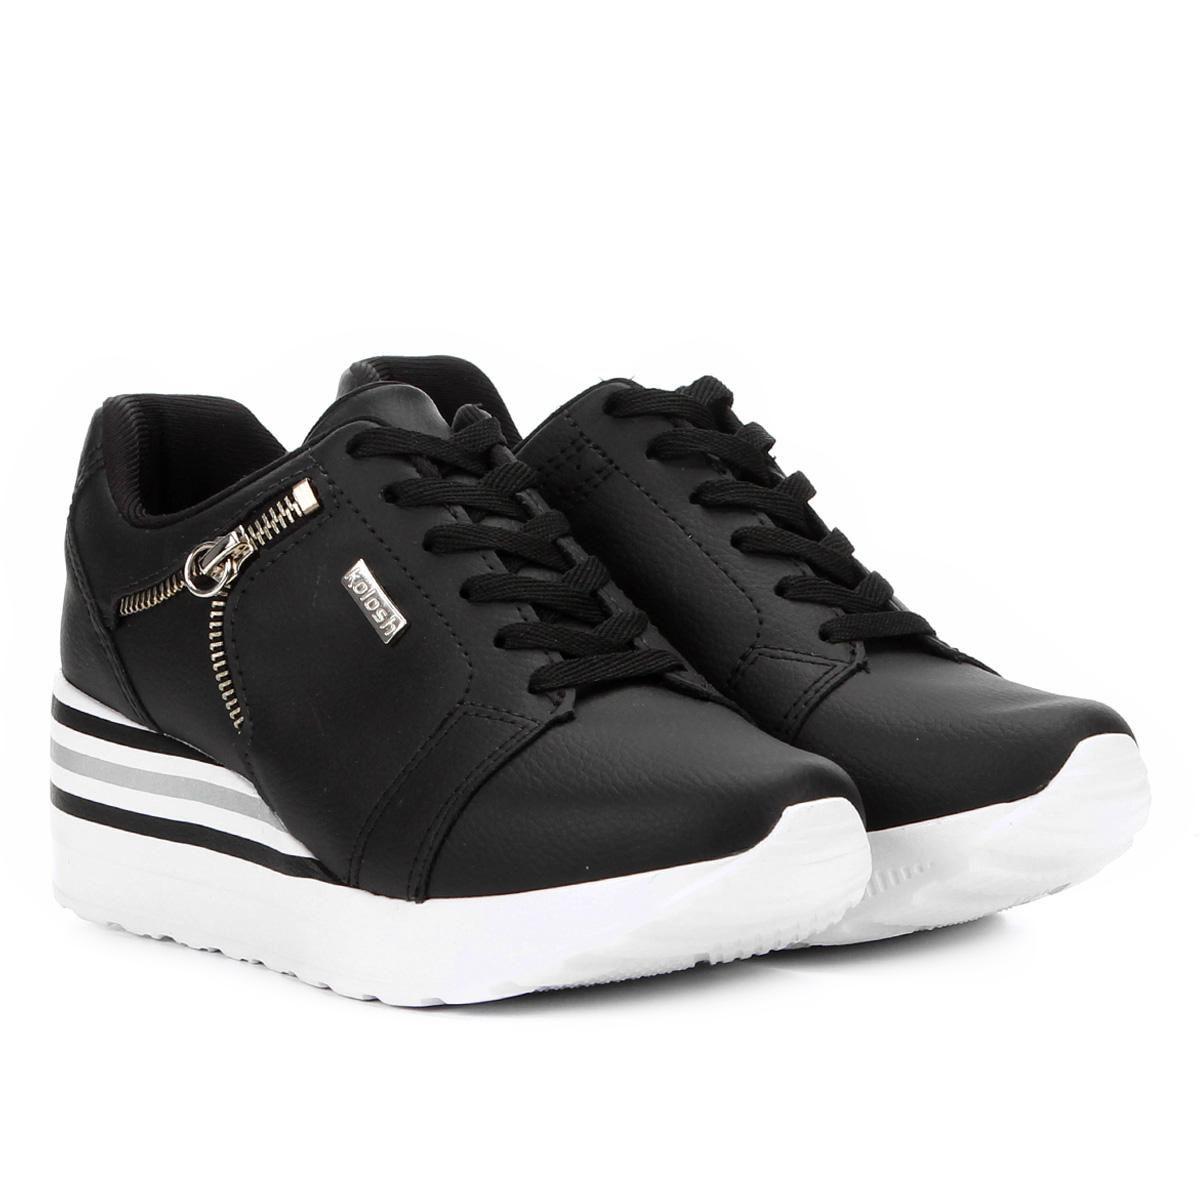 Tênis Kolosh Sneaker Anabela Zíper Lateral Feminina C1402  - Ian Calçados